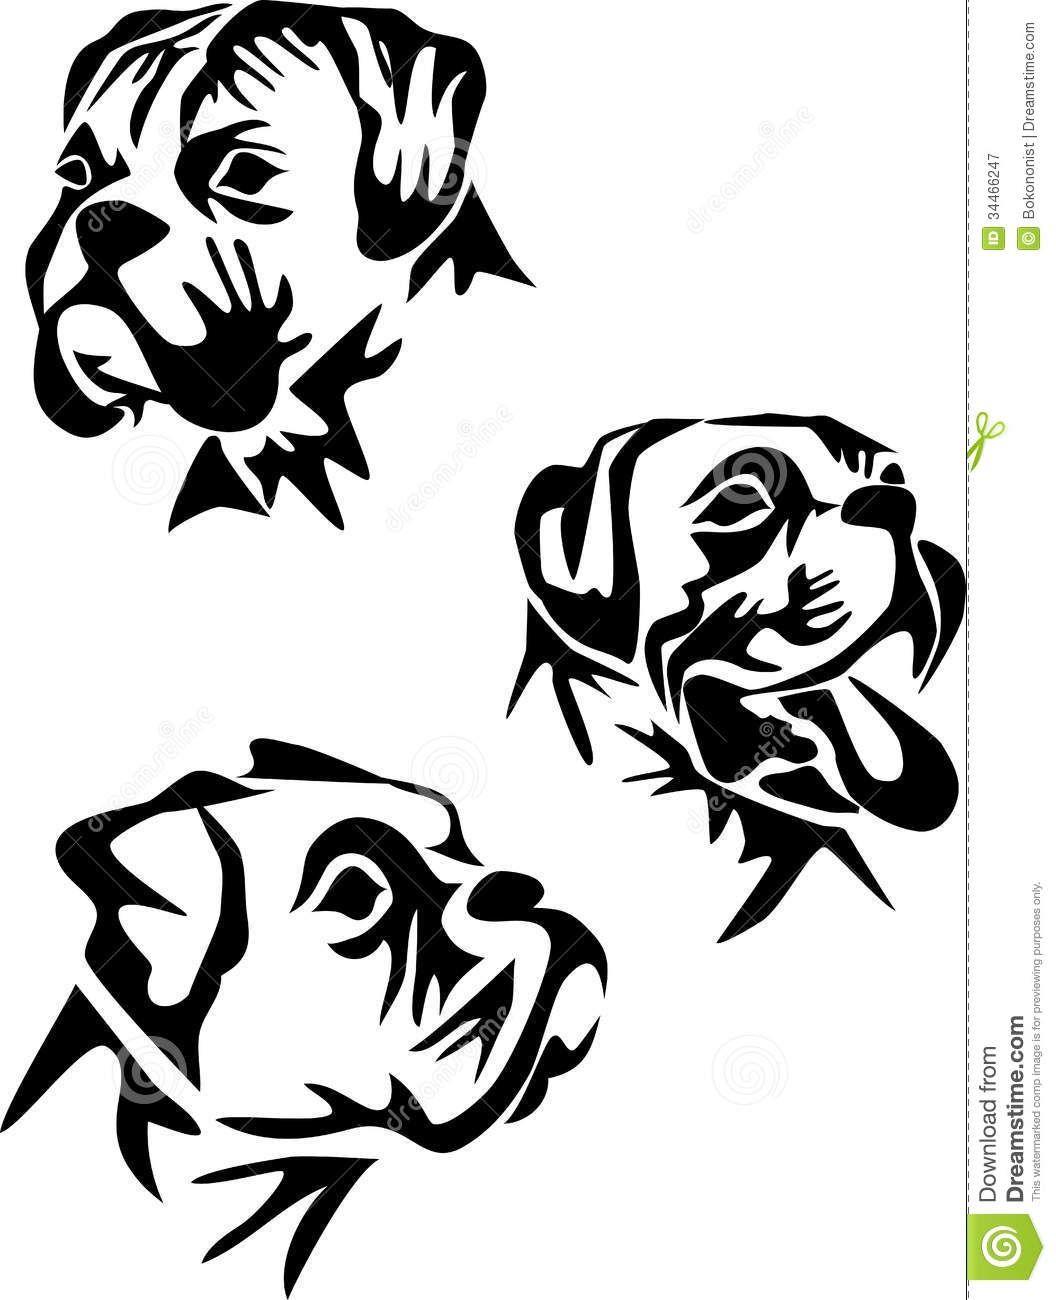 Boxer clipart boxer dog. Pin by sofia svensson